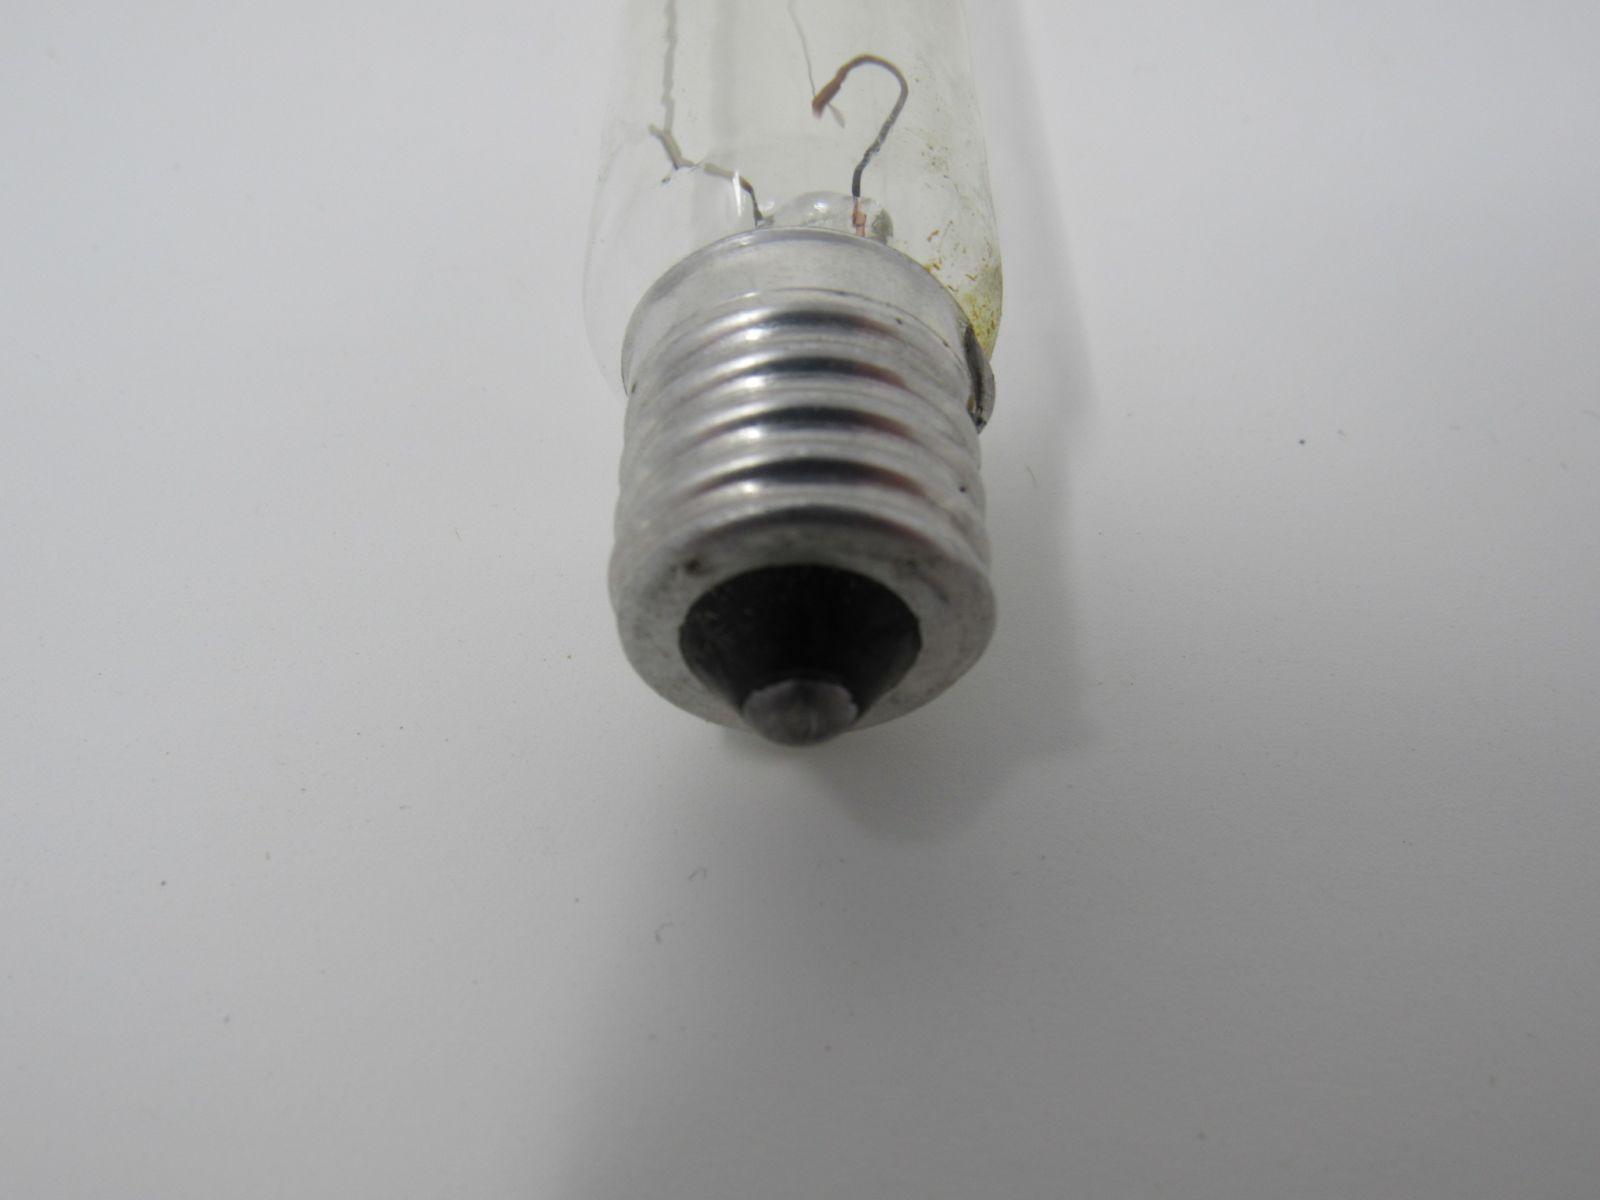 Philips 25W Tubular Incandescent Bulb T61/2 Clear E17 Base 5CT61/2-P Vintage